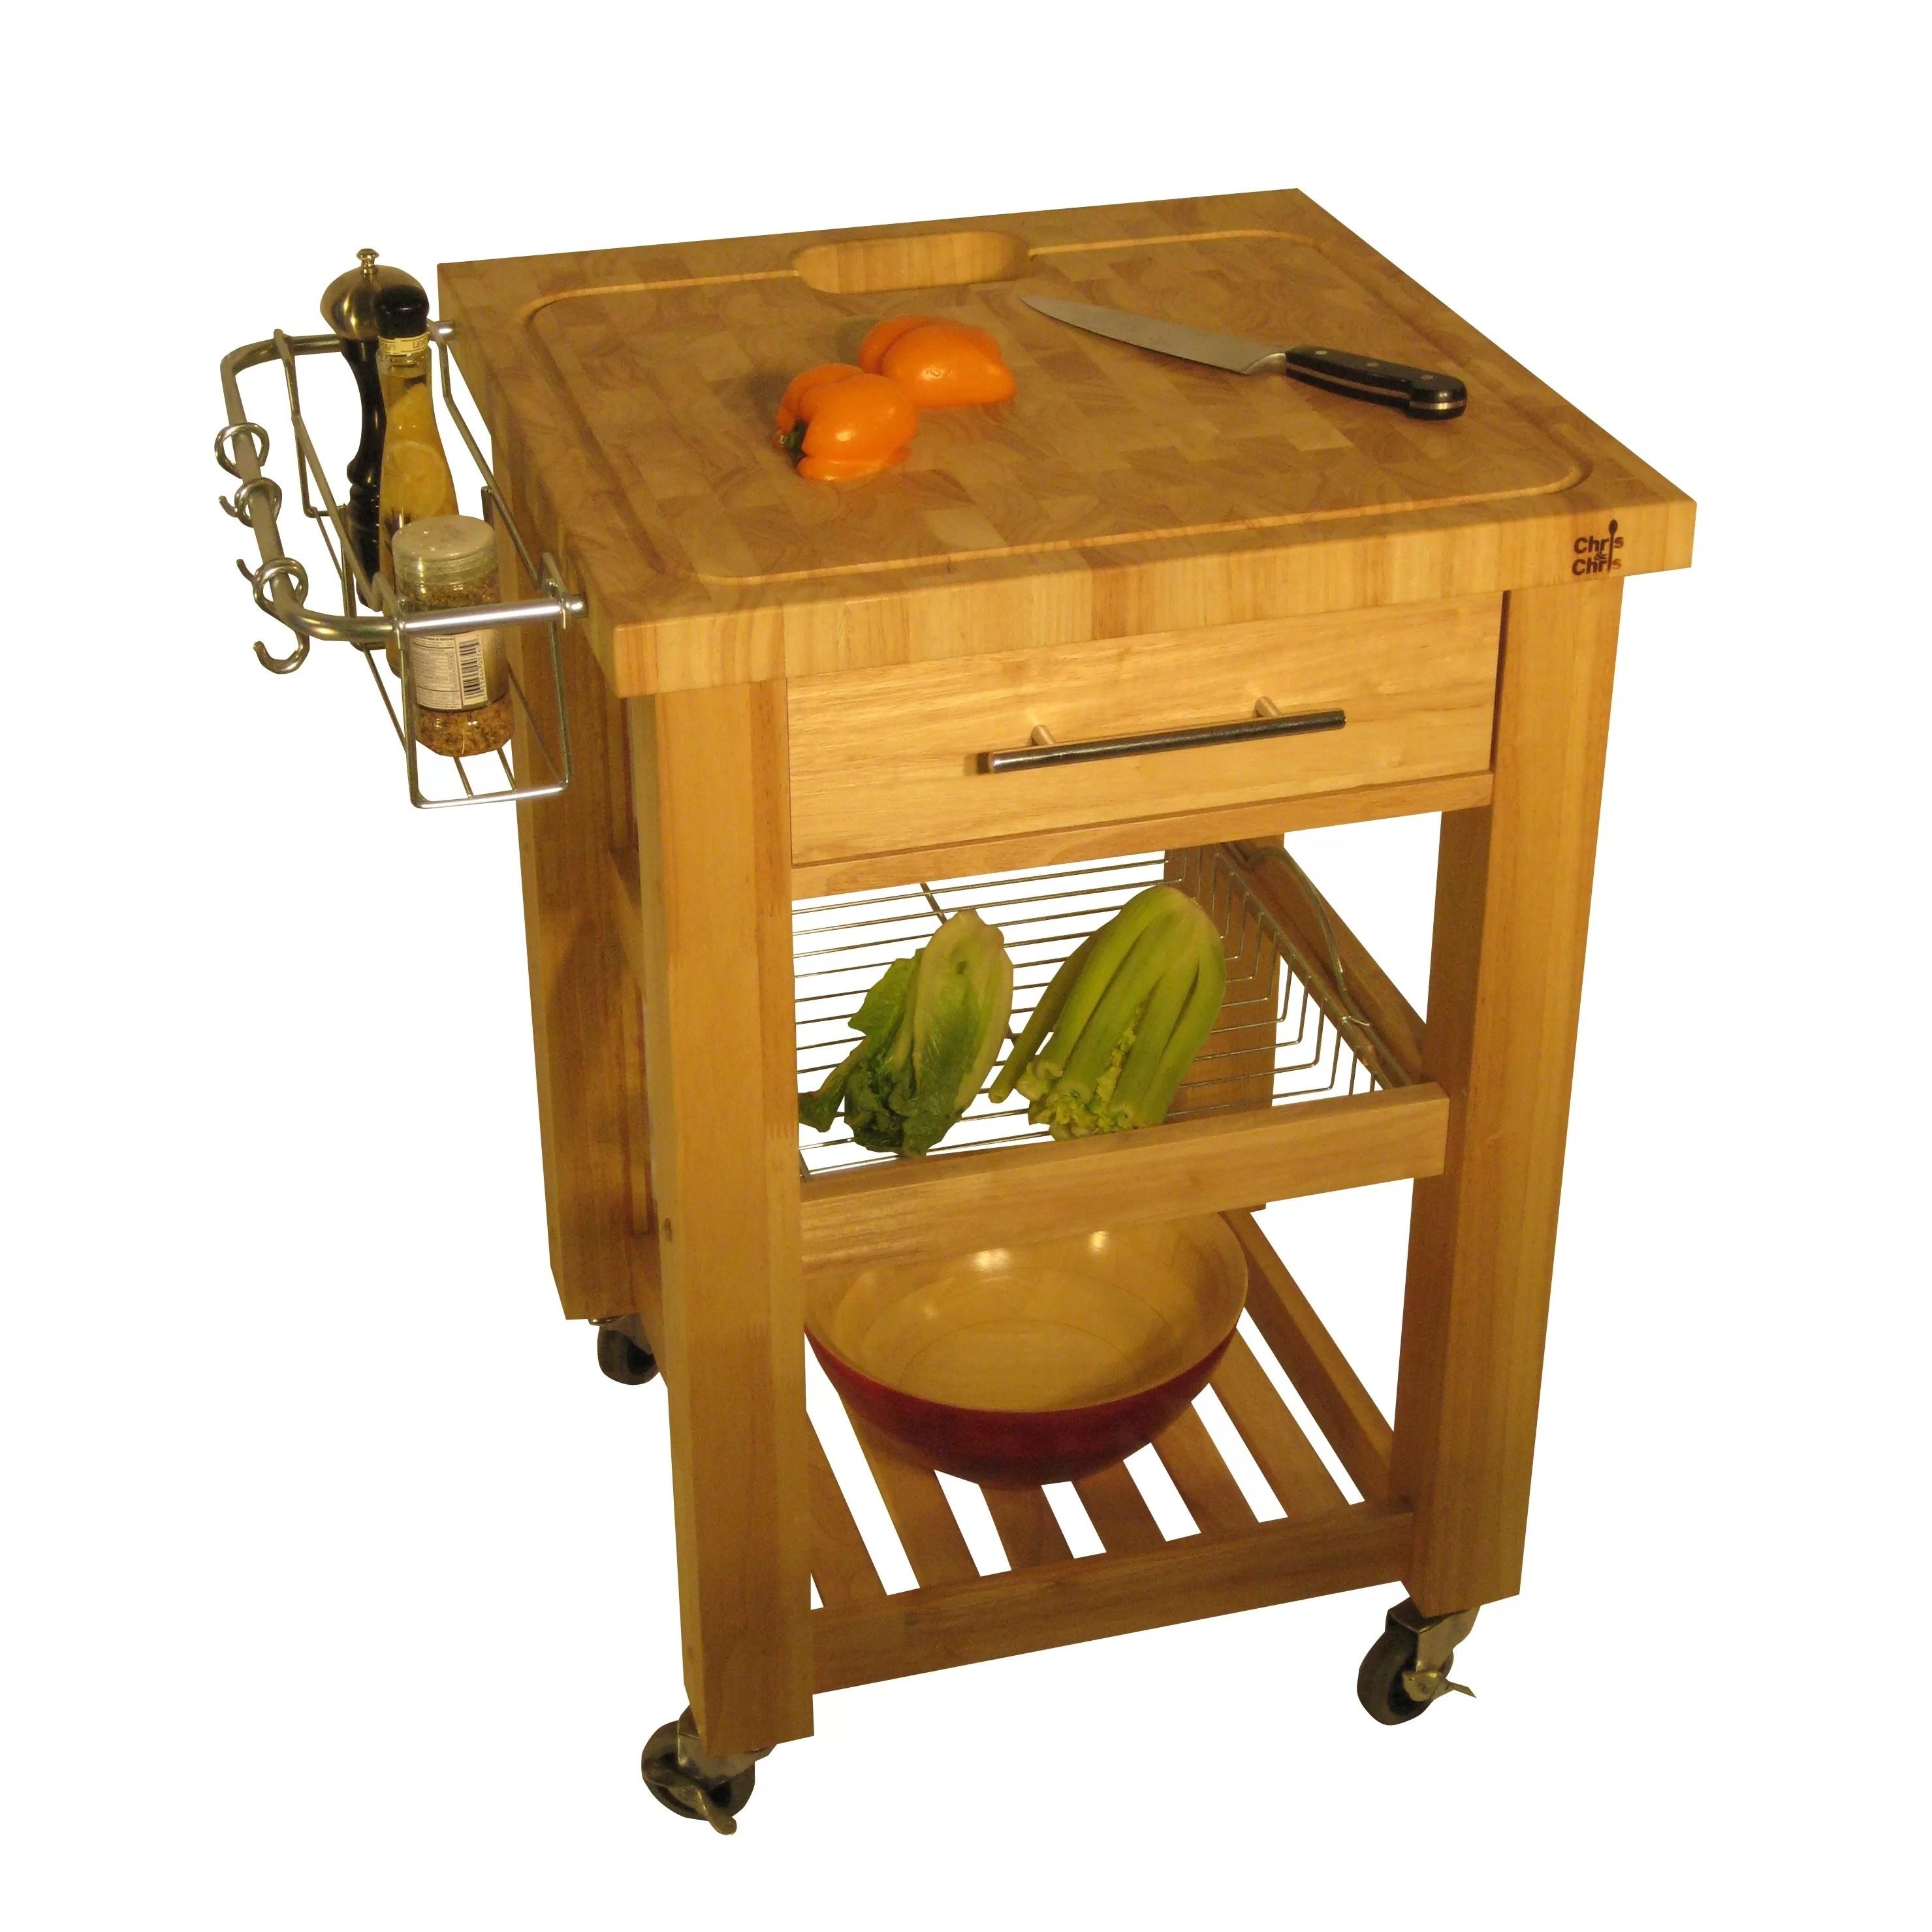 chris and kitchen cart outdoor bbq pro chef reviews wayfair